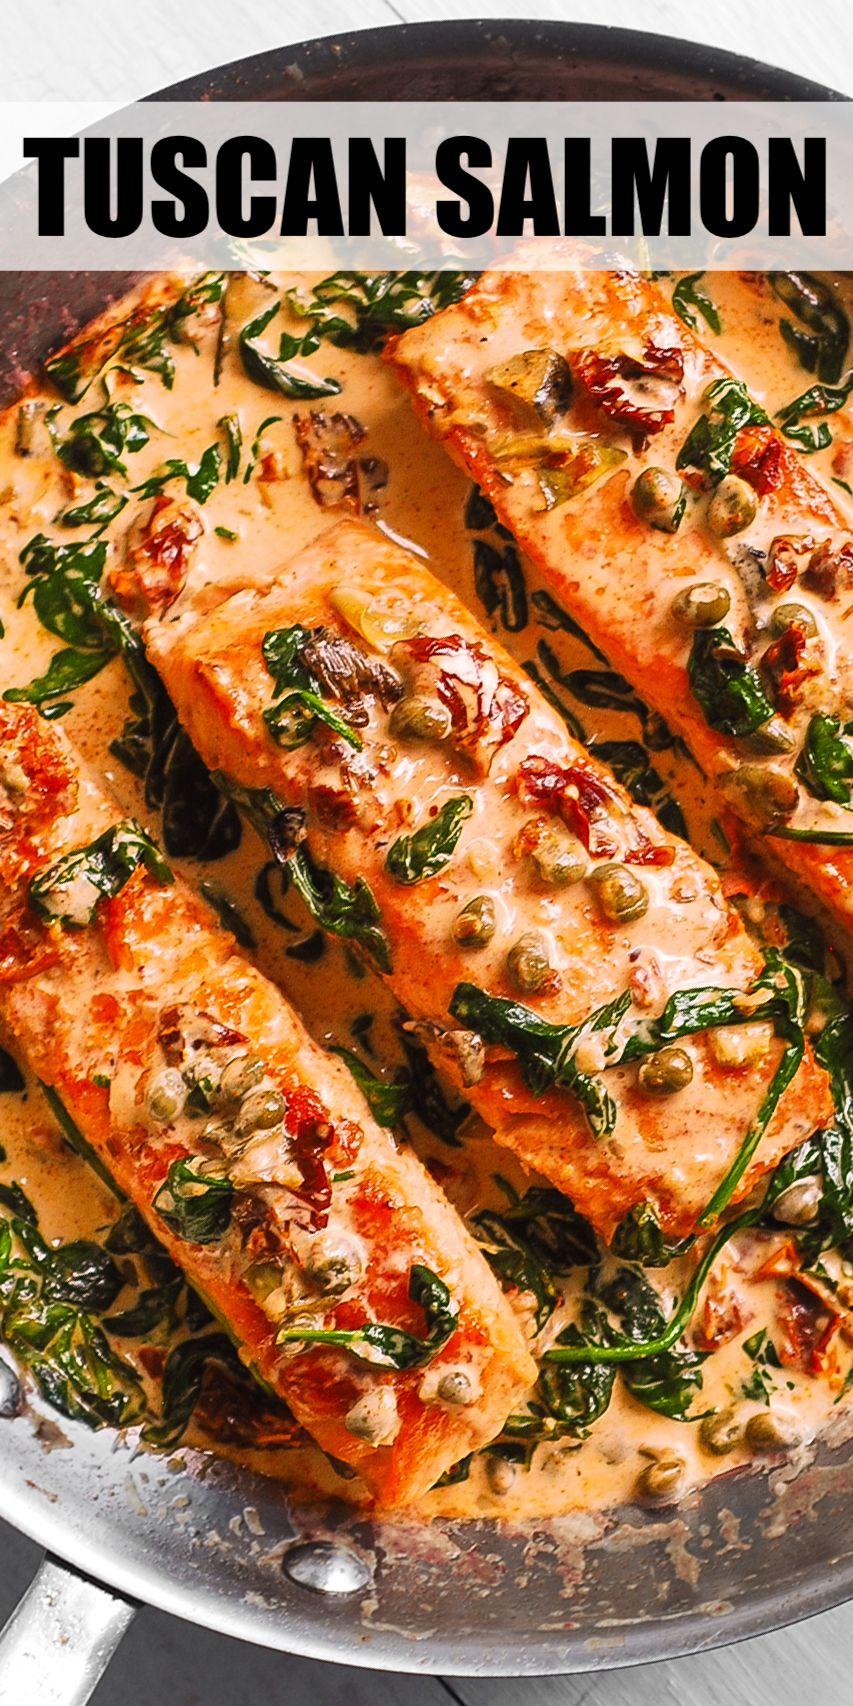 Creamy Tuscan Salmon with Spinach, Artichokes, Sun